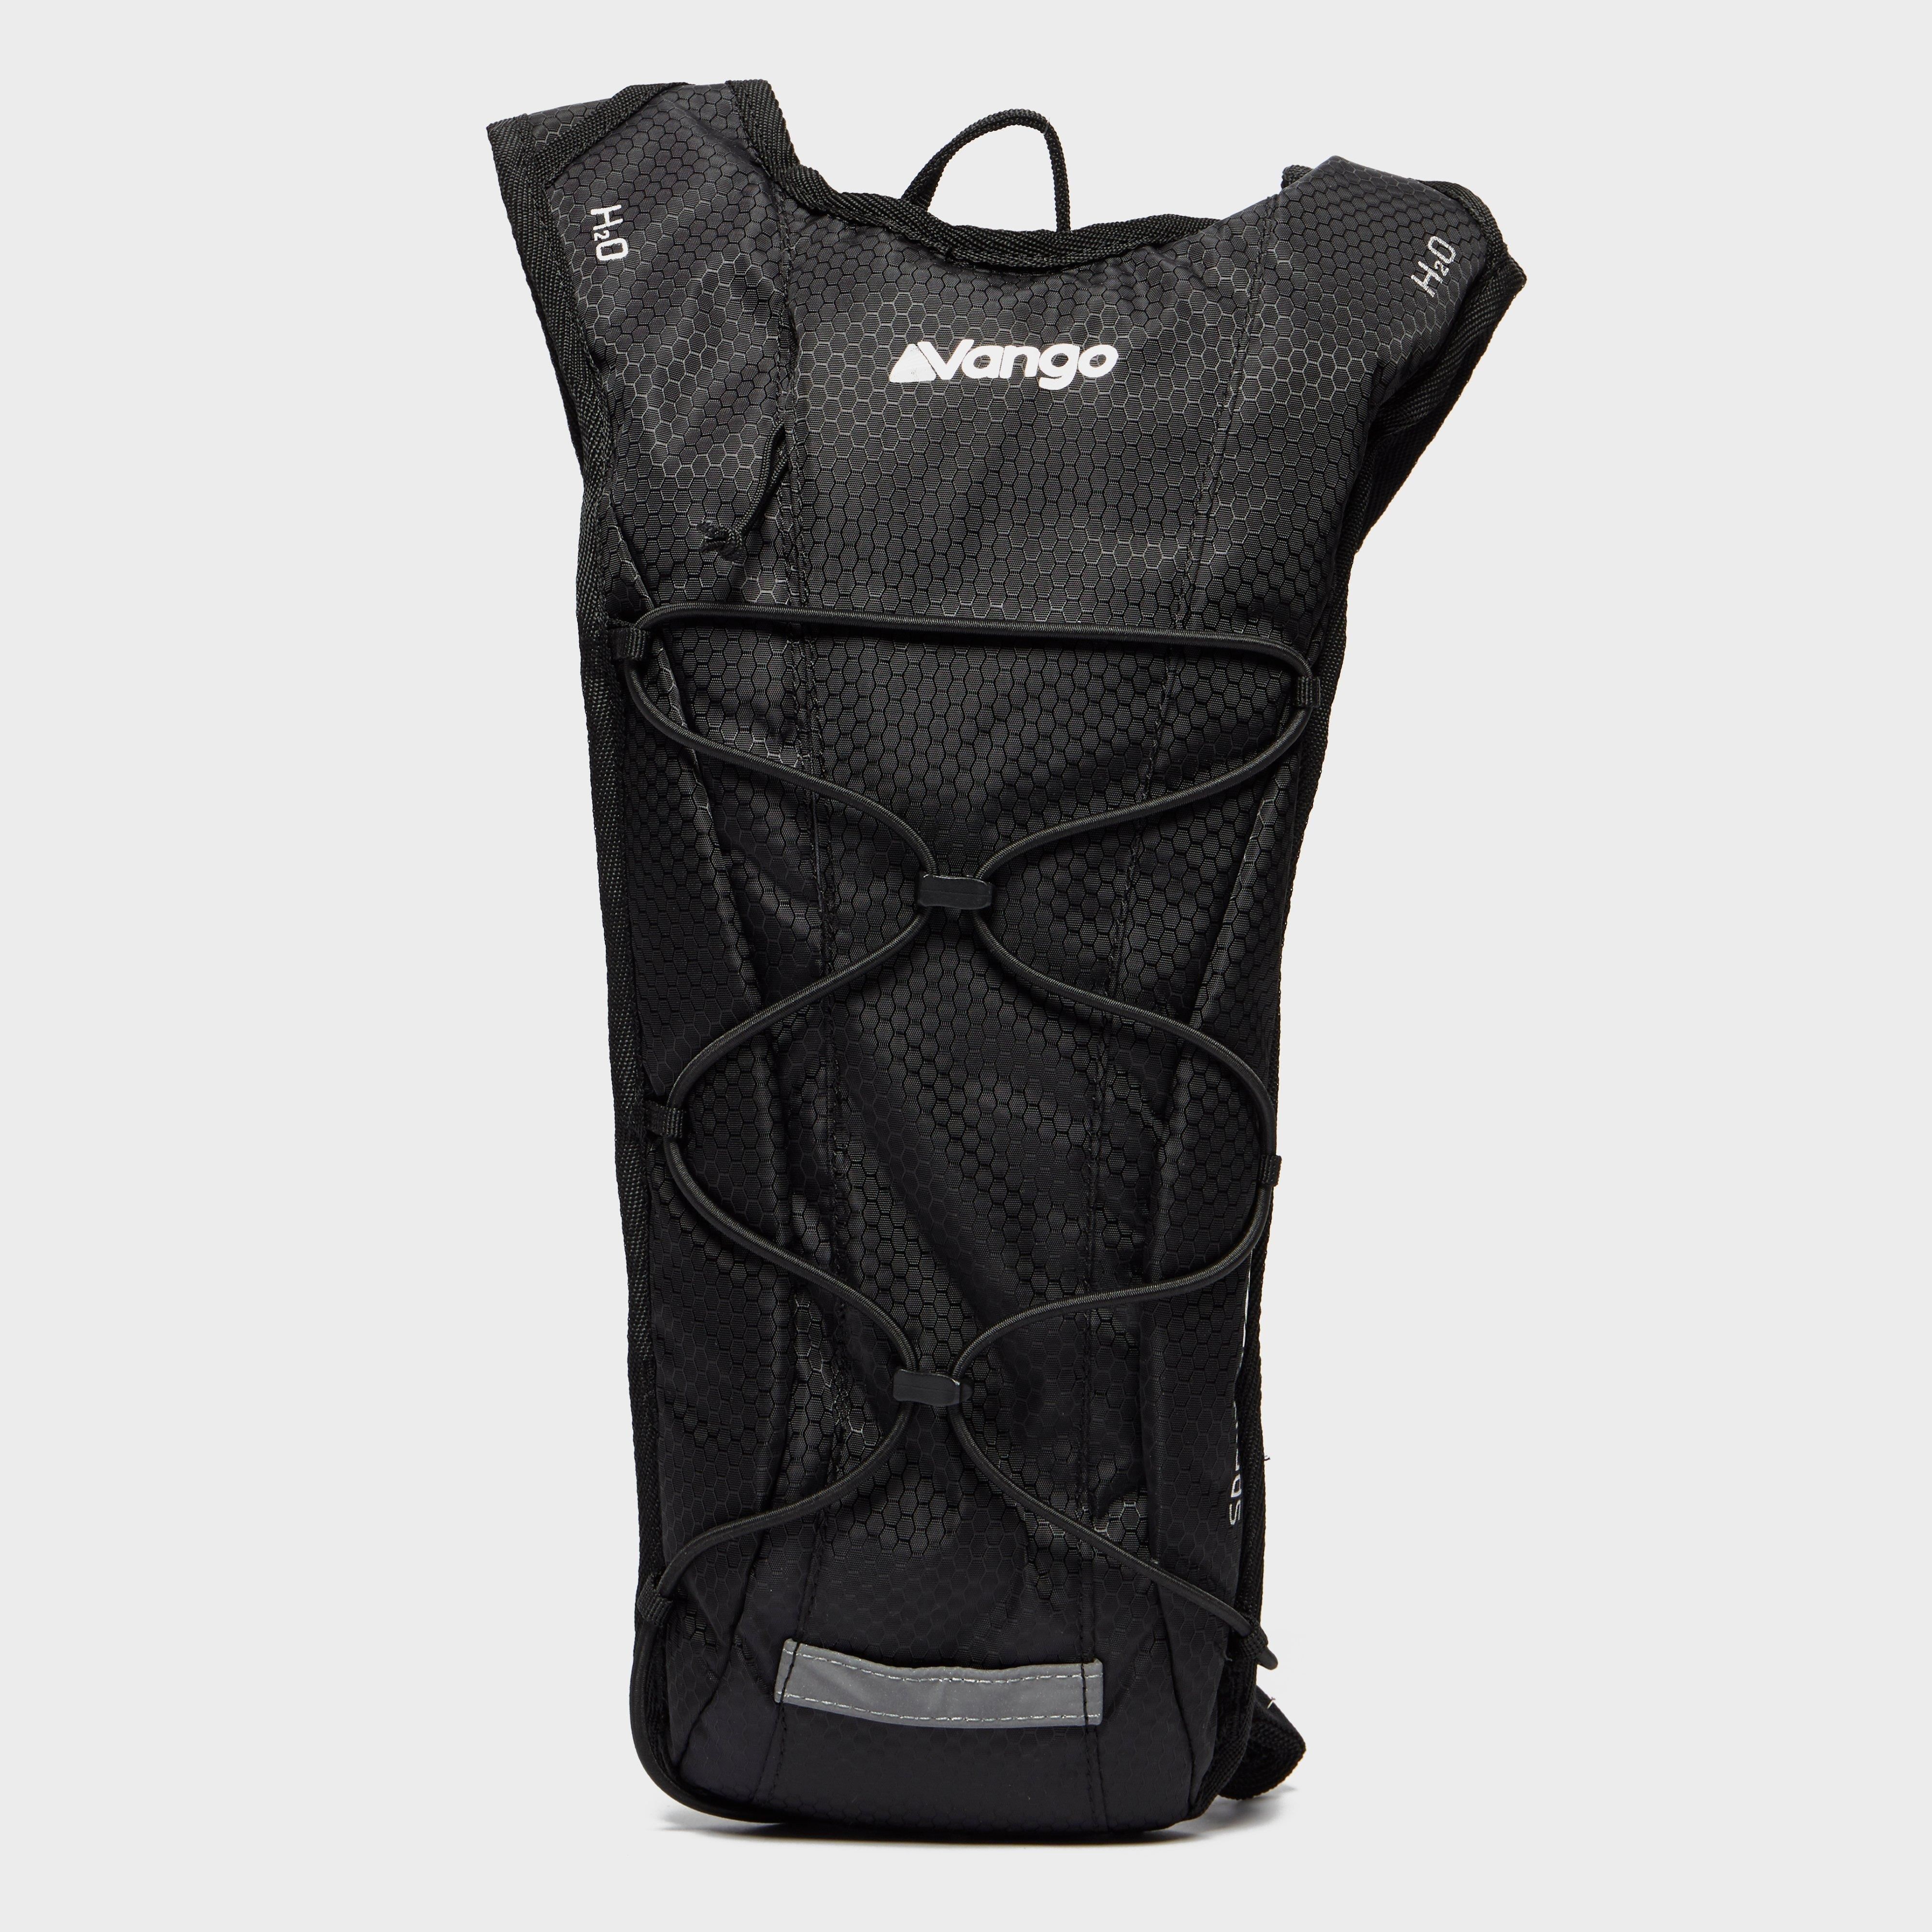 Vango Sprint 3 Hydration Pack, Black